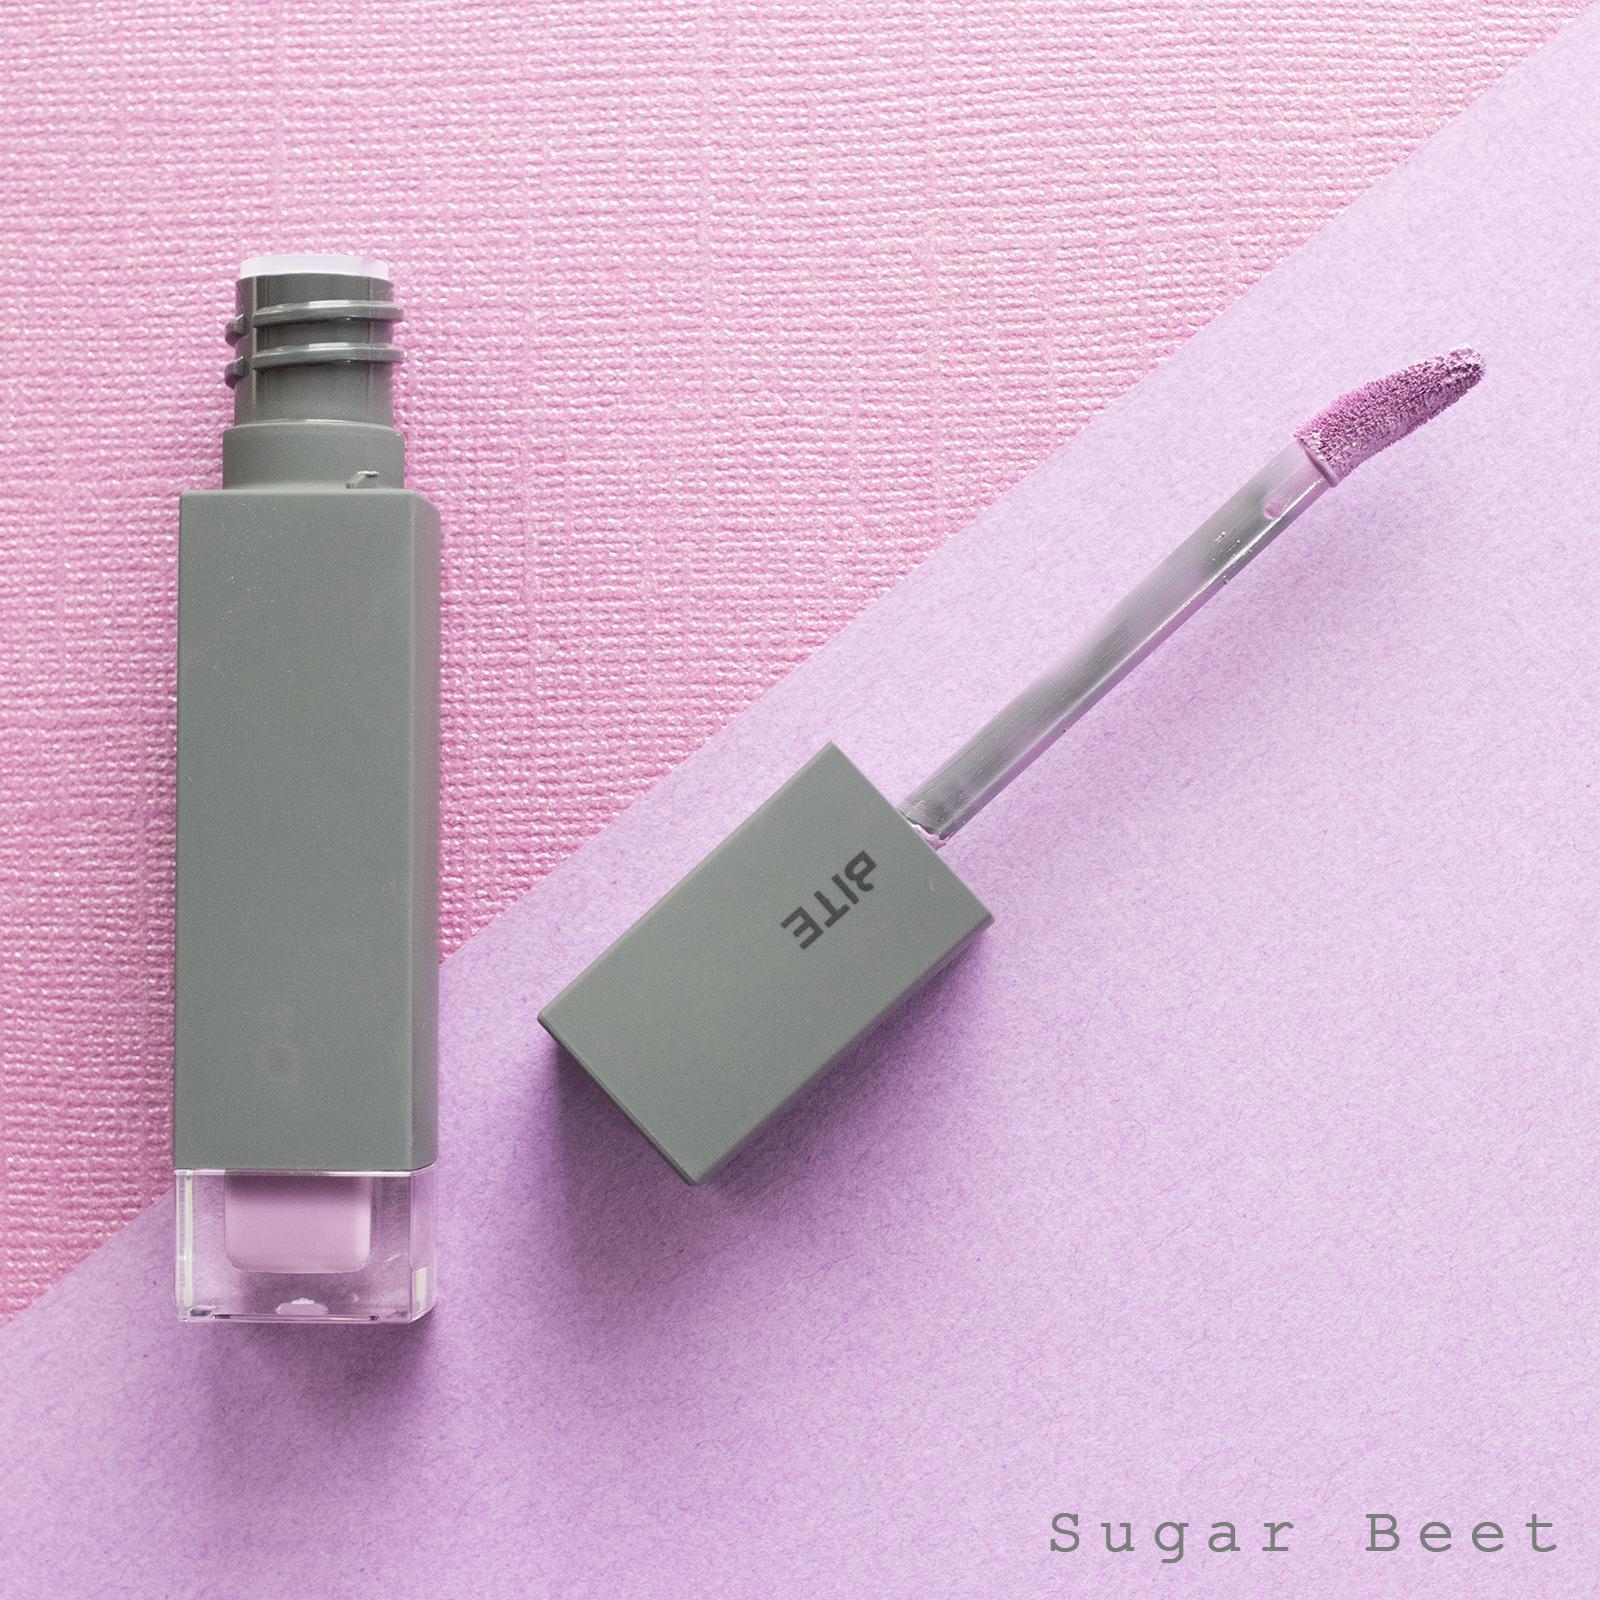 Bite Beauty Sugar Beet